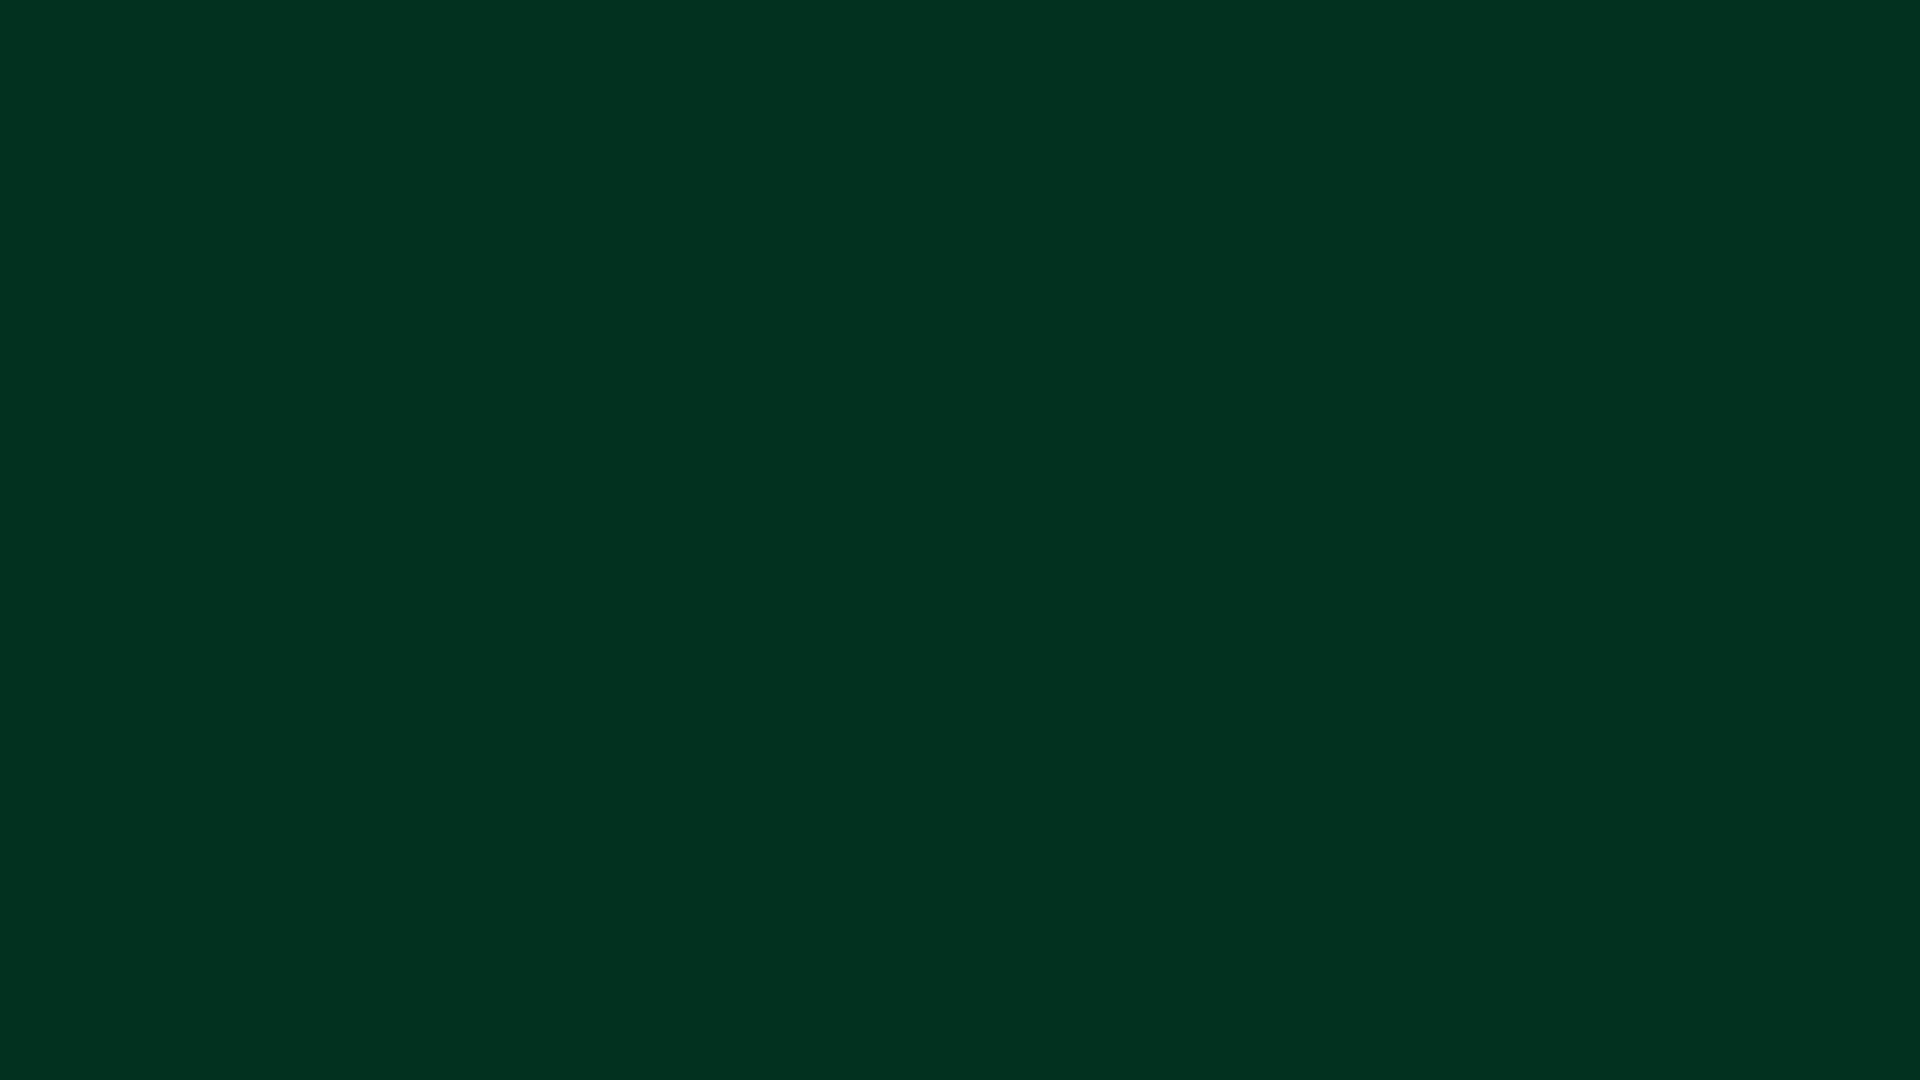 Dark Green Solid Color Wallpaper 2105 1920 x 1080 – WallpaperLayer.com